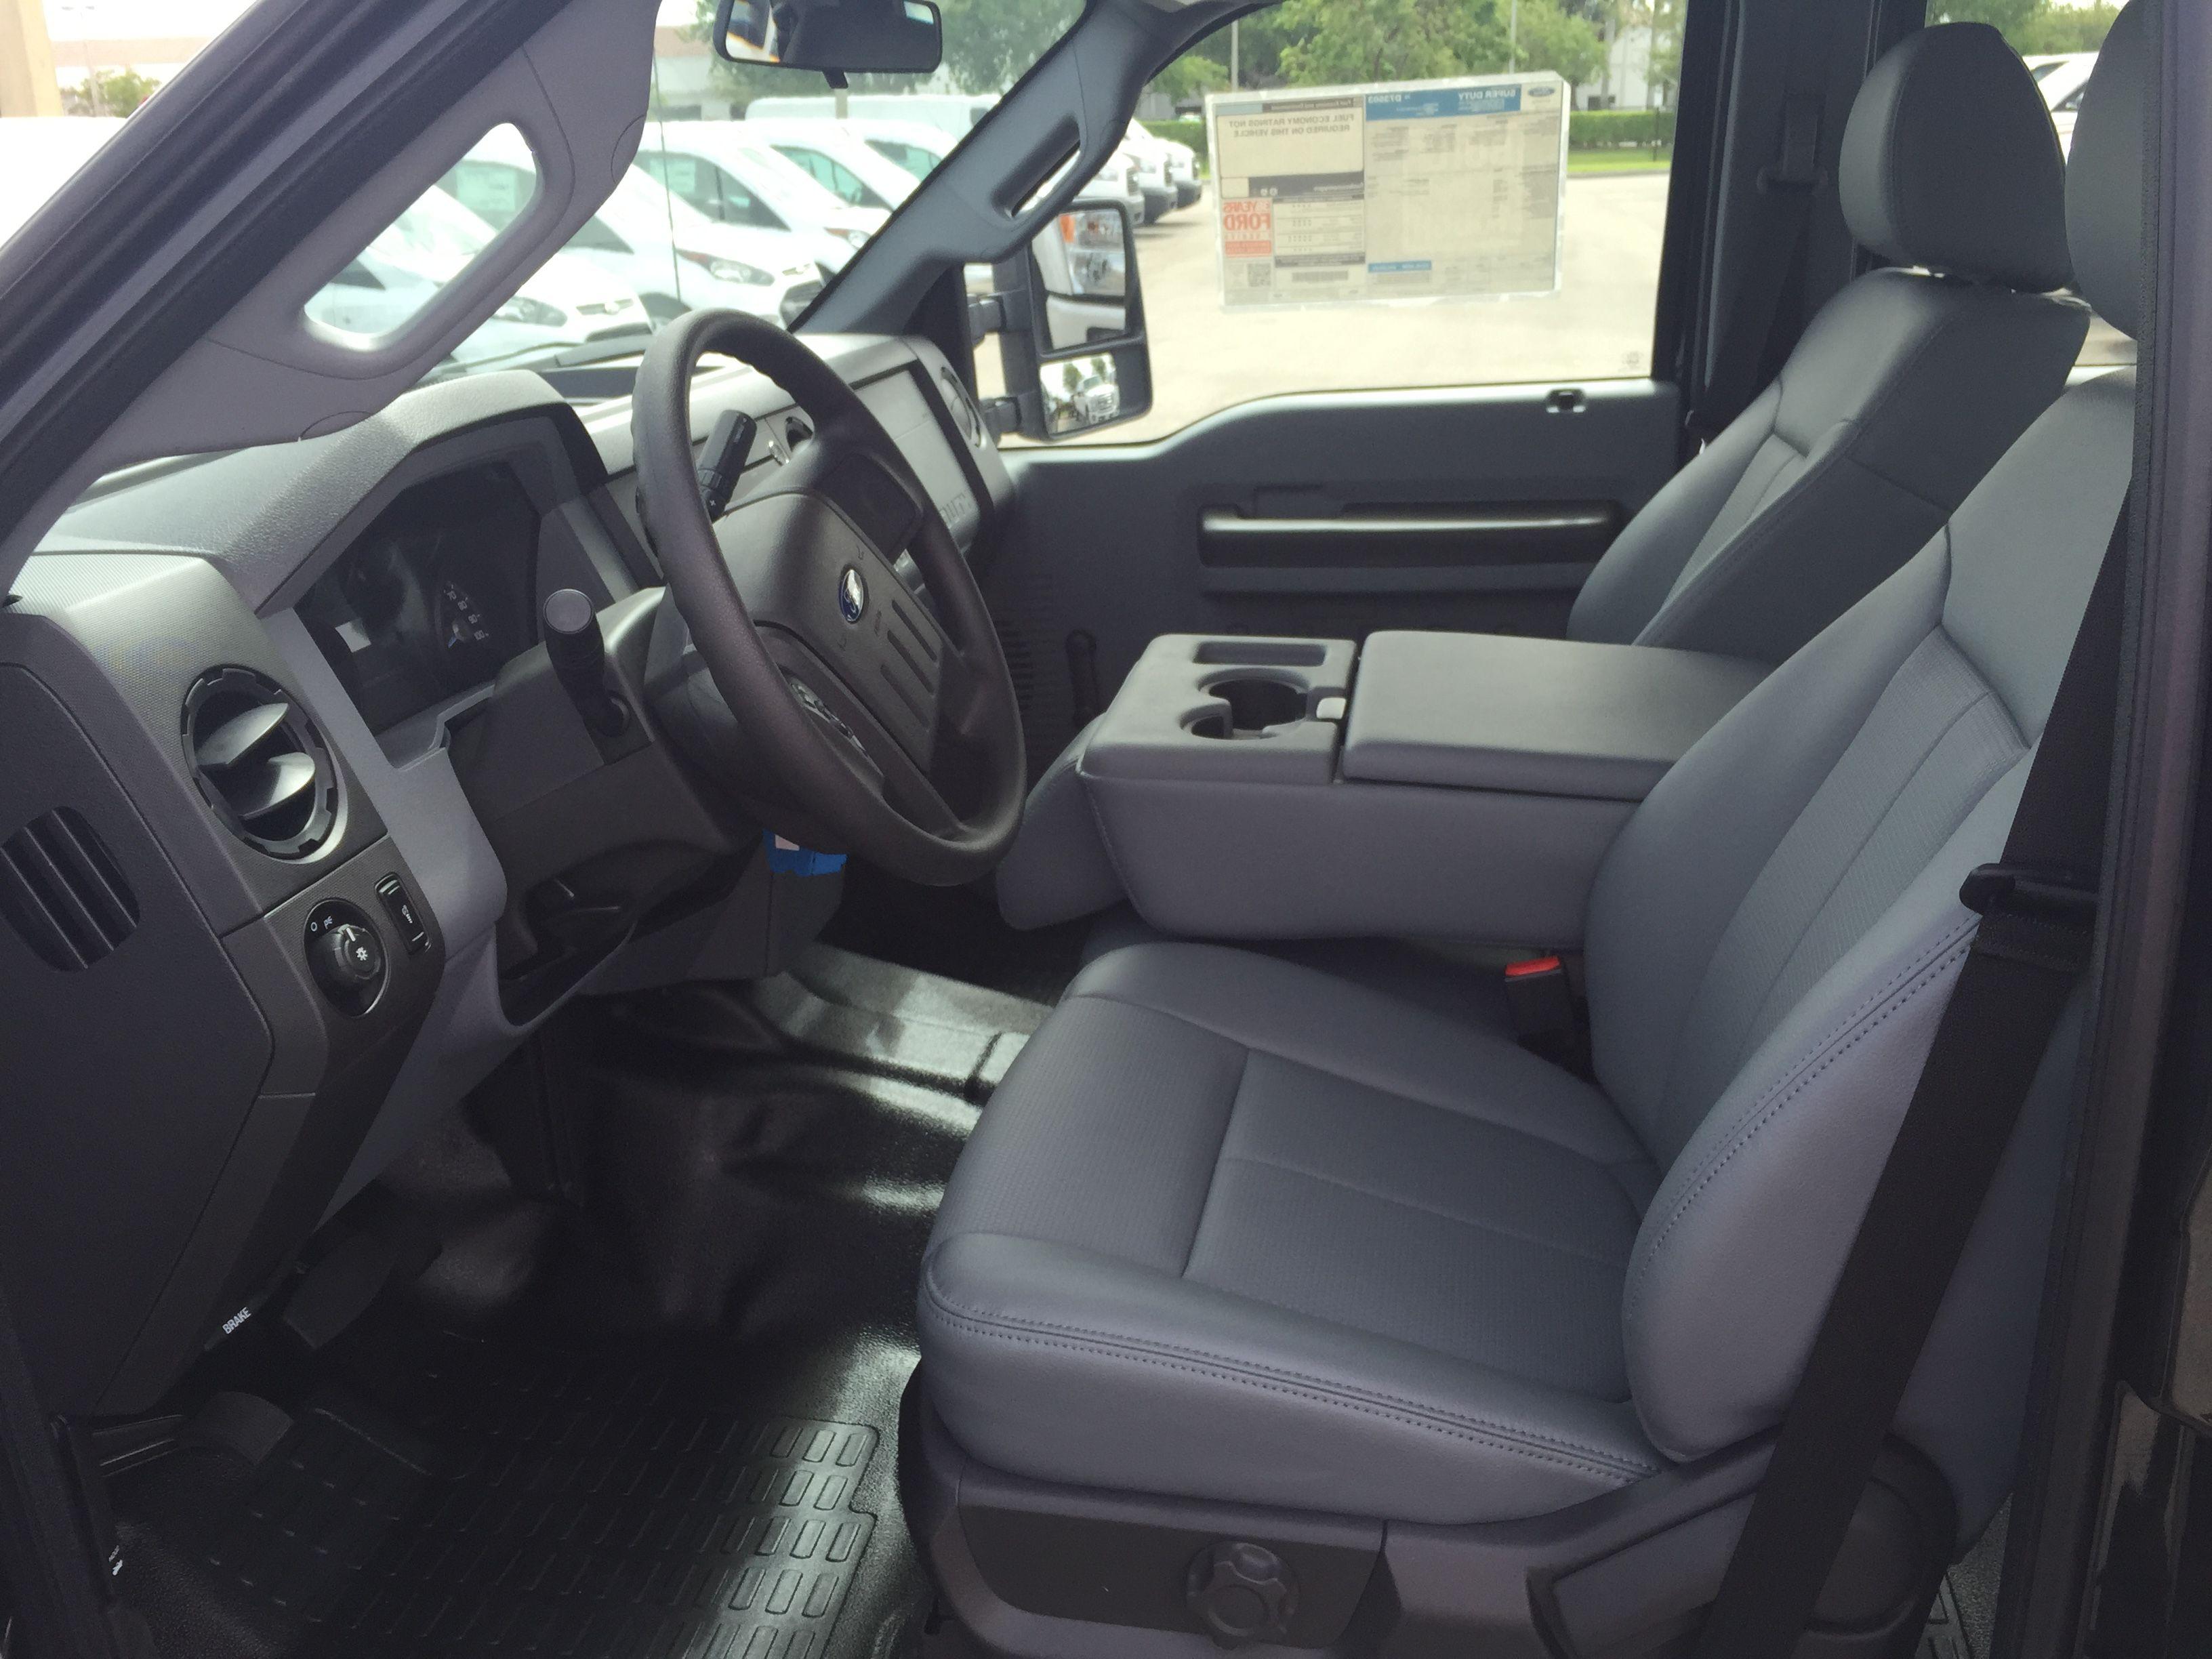 2015 Ford F-250 6.7L interior, base model. | Truck ...